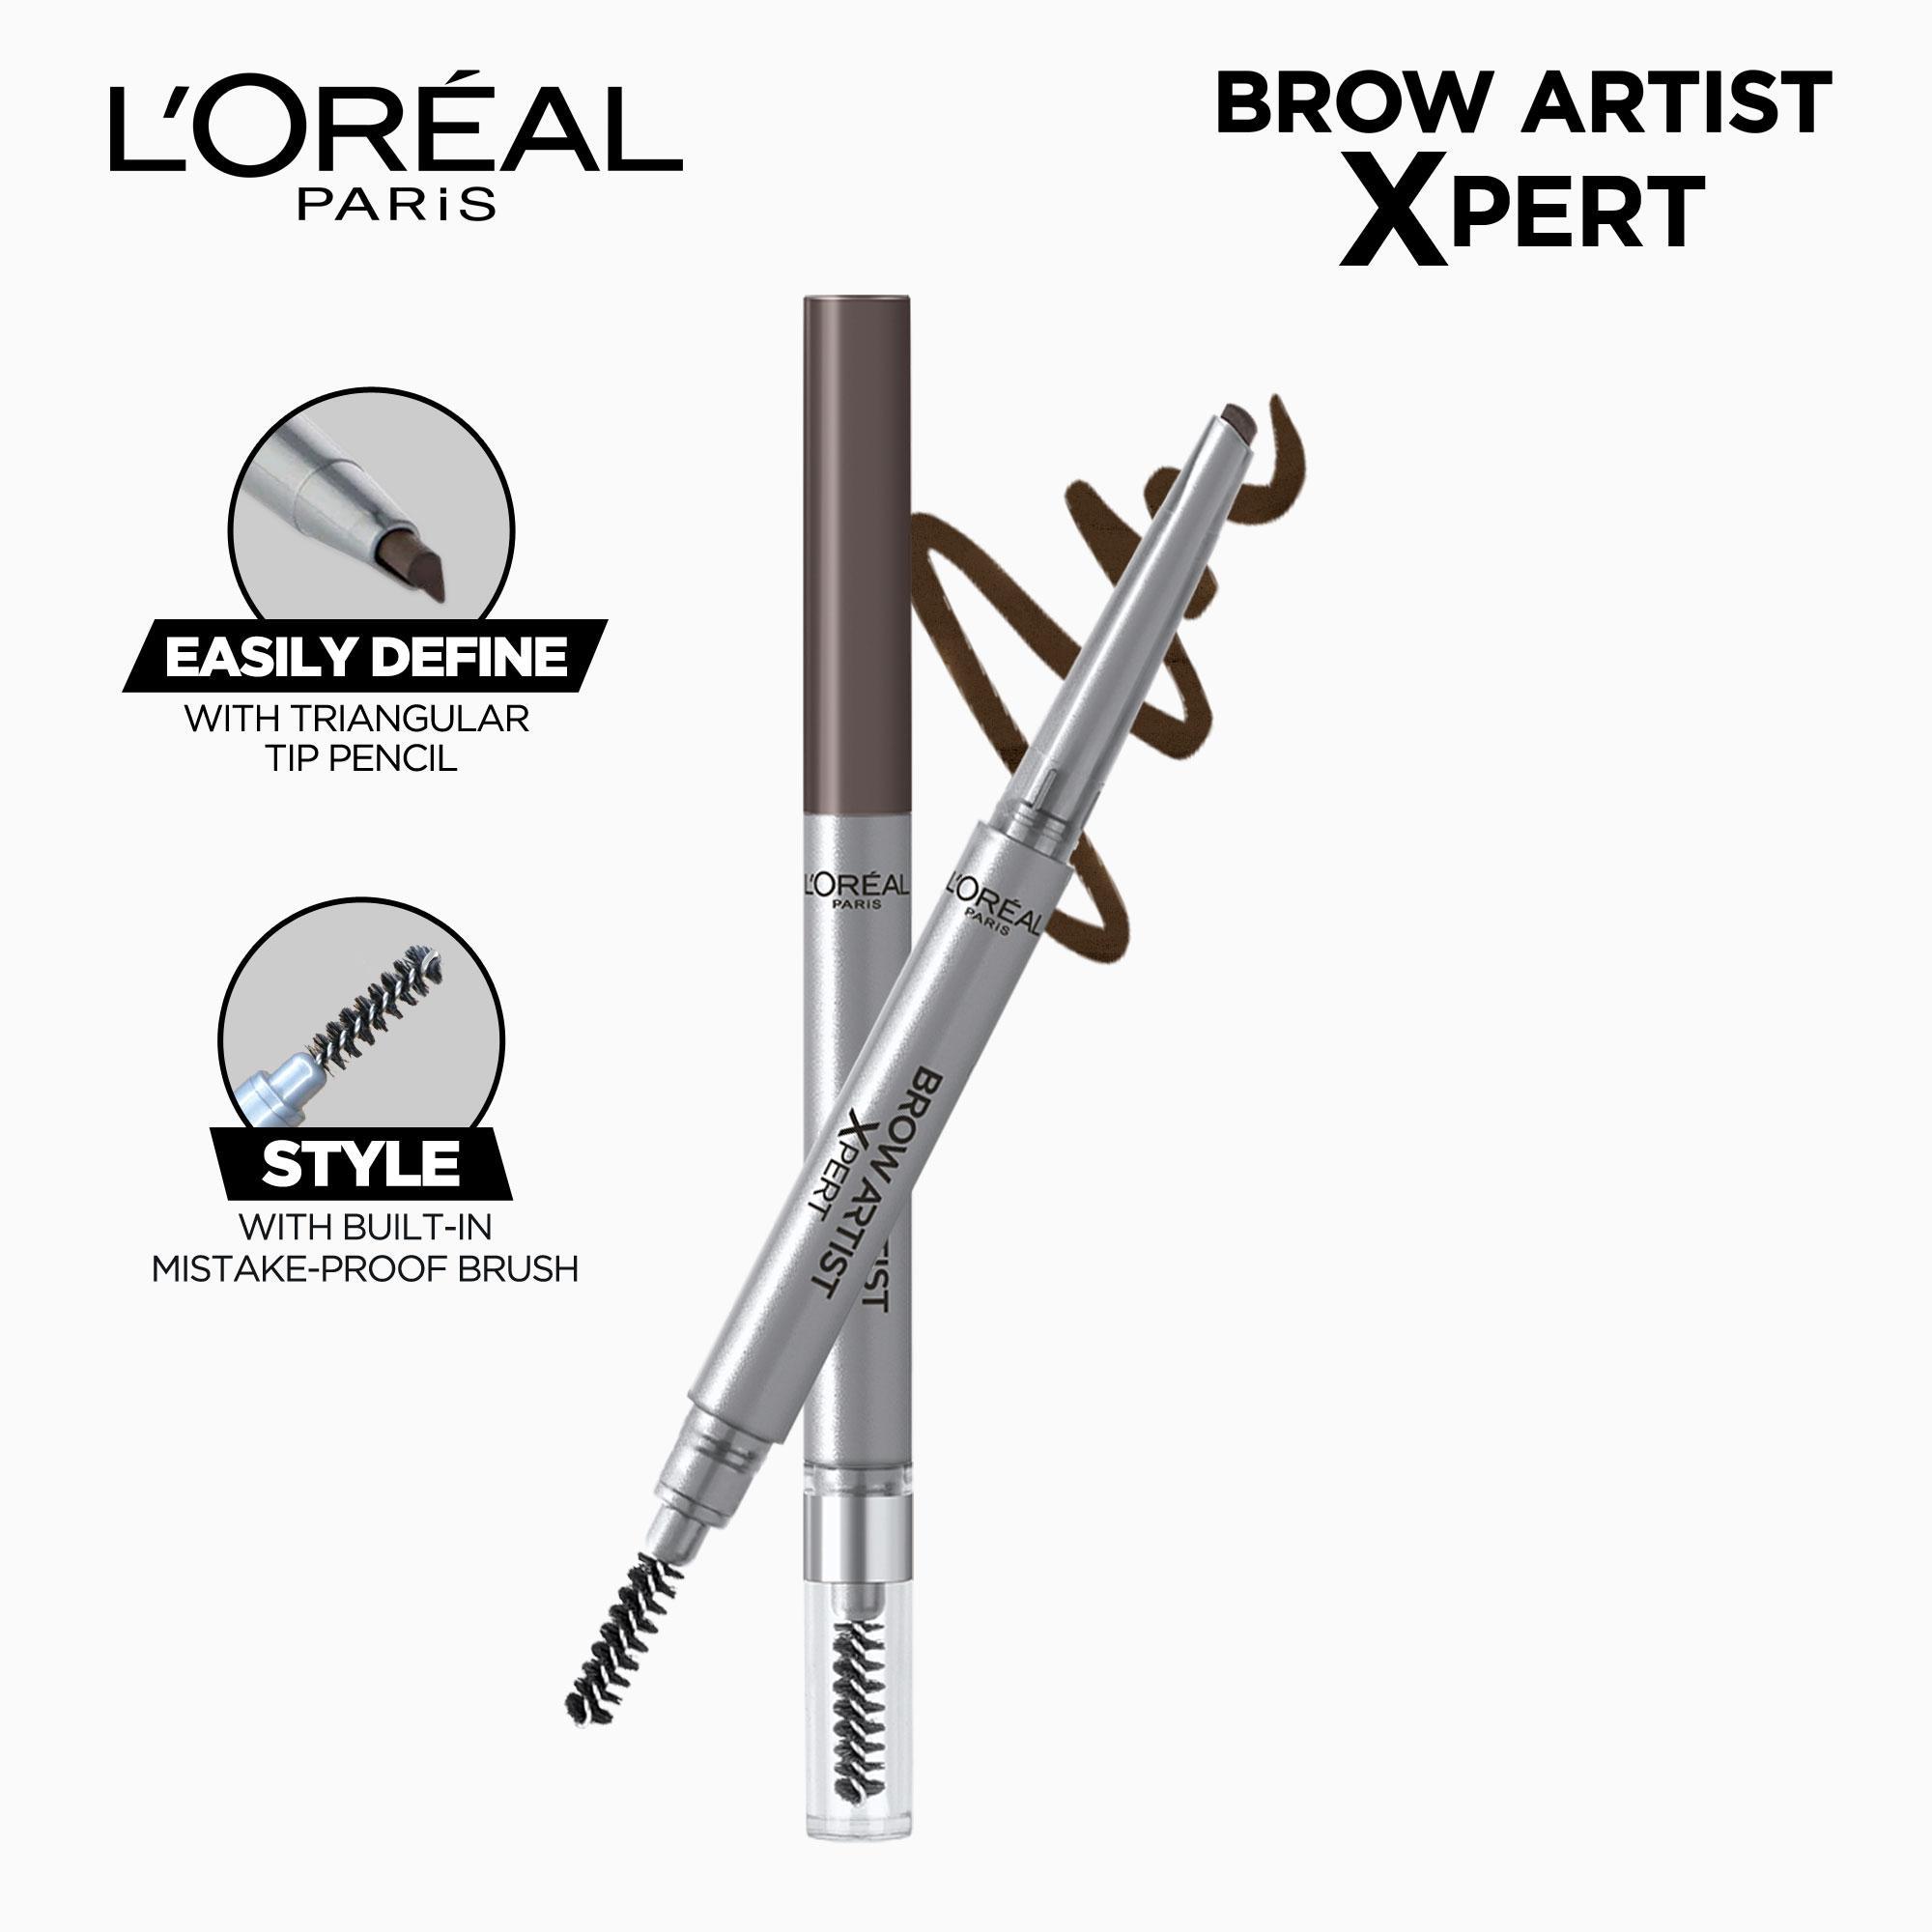 Brow Artist Xpert 2-in-1 Brow Pencil- 107 Cool Brunette by LOréal Paris Brow Artist Philippines